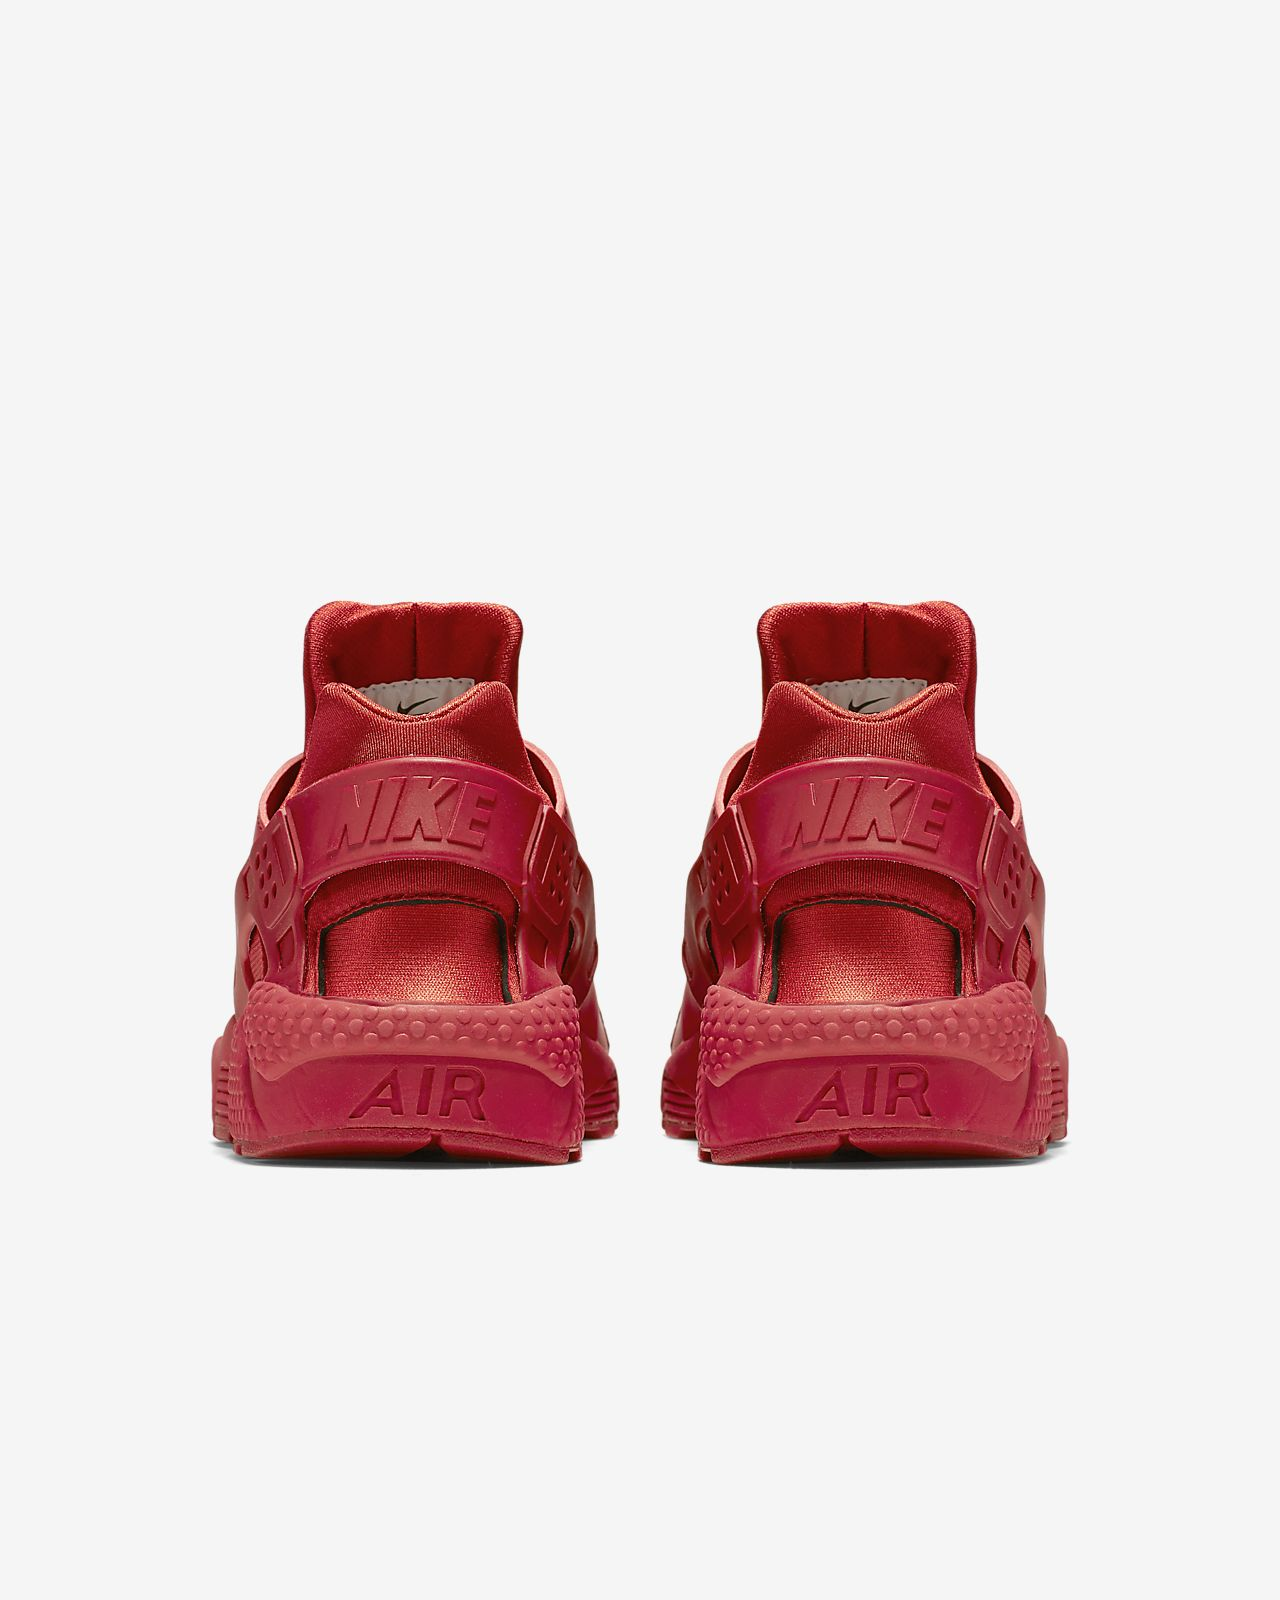 07e036c38b5 Nike Air Huarache Men's Shoe